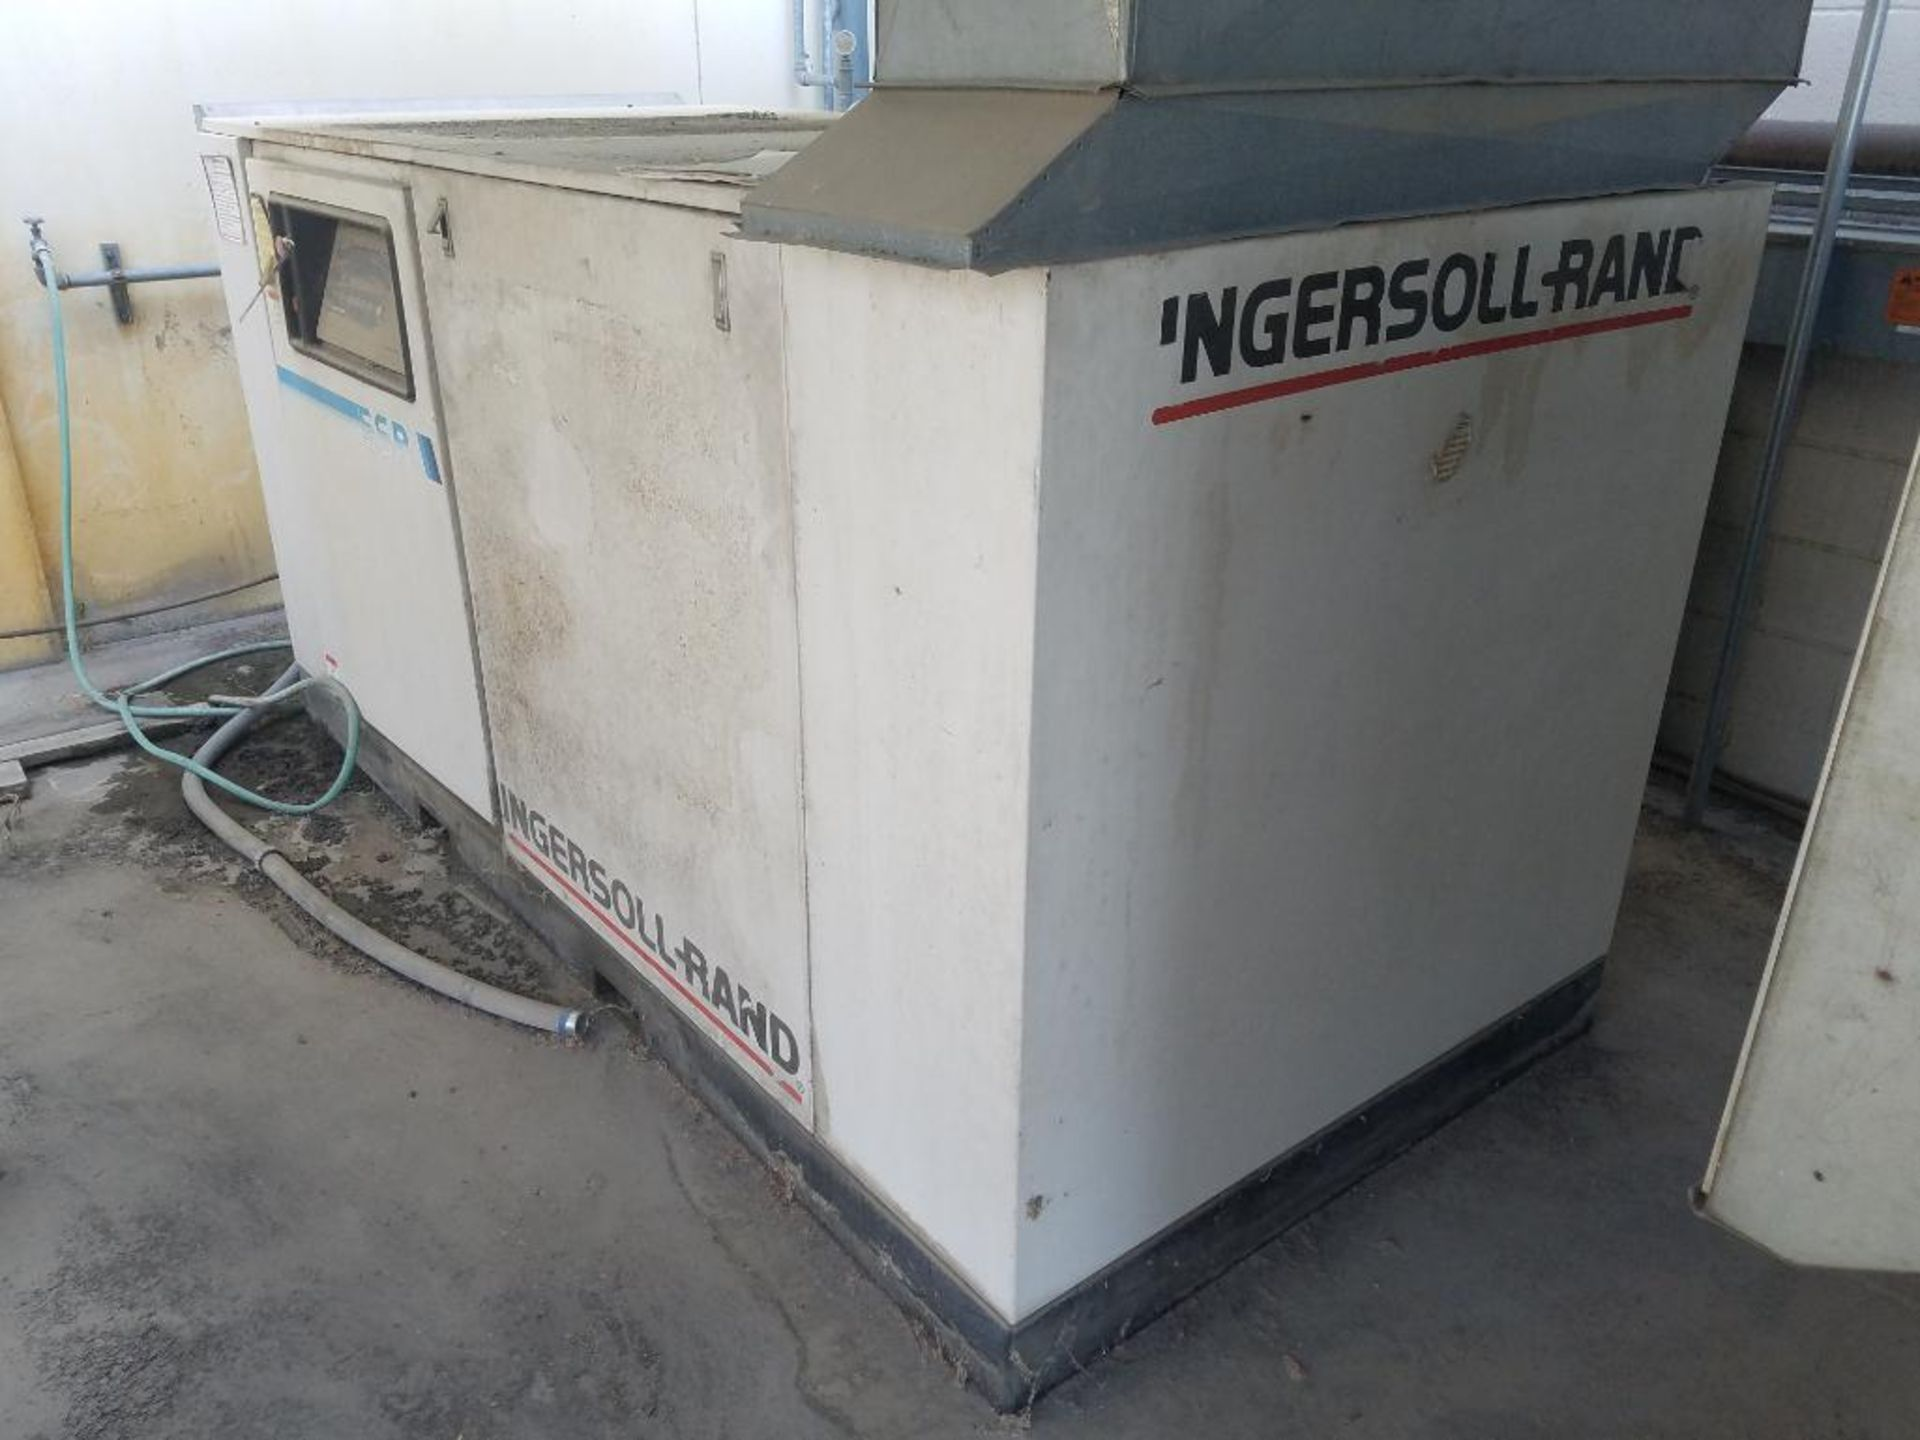 Ingersoll Rand rotary screw air compressor, 75 hp